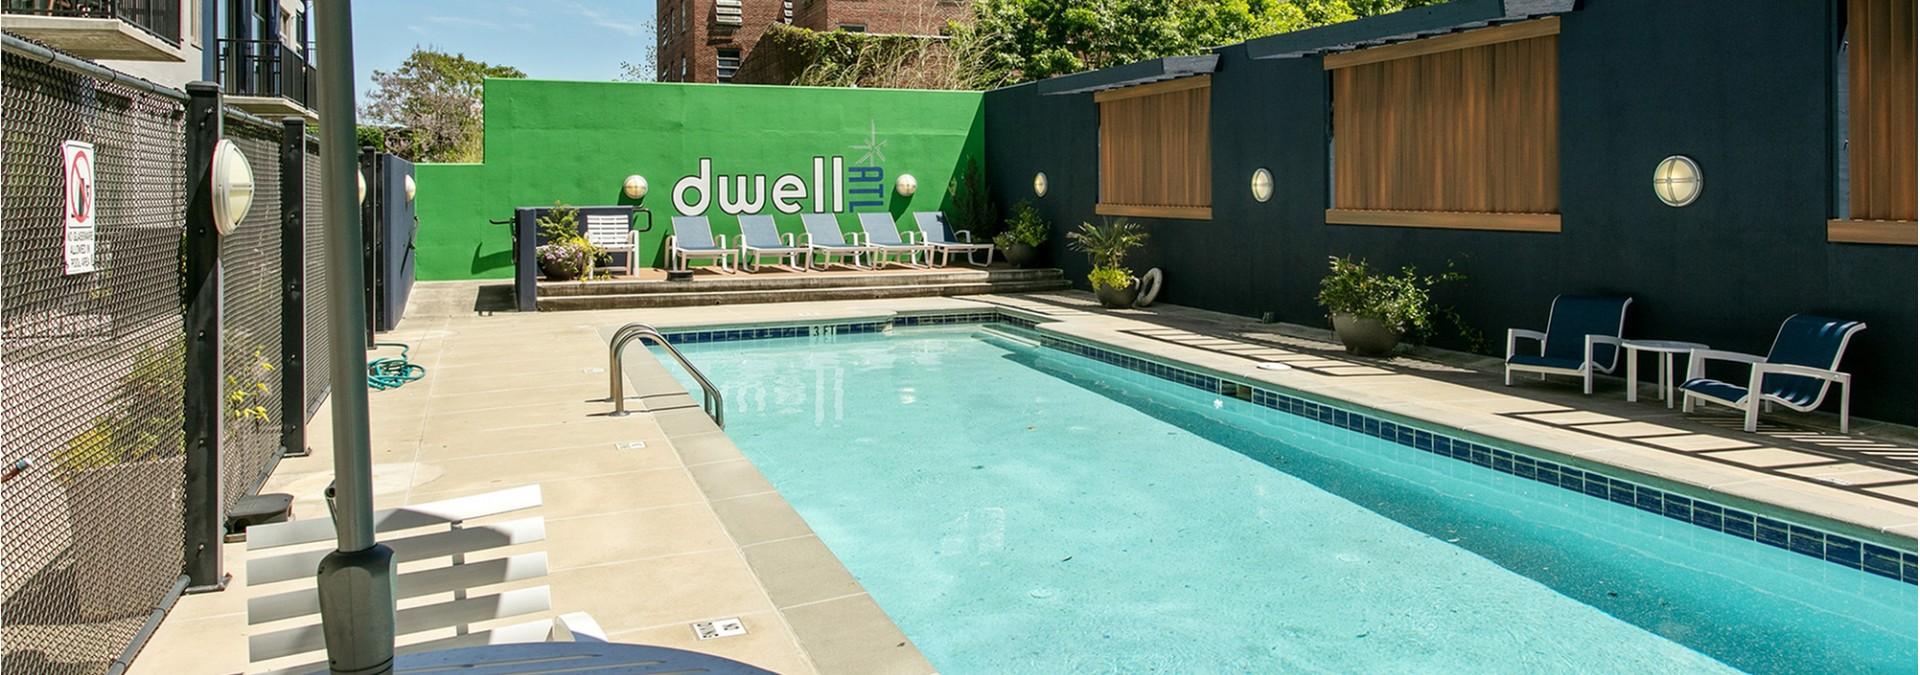 Dwell ATL Luxury Apartments